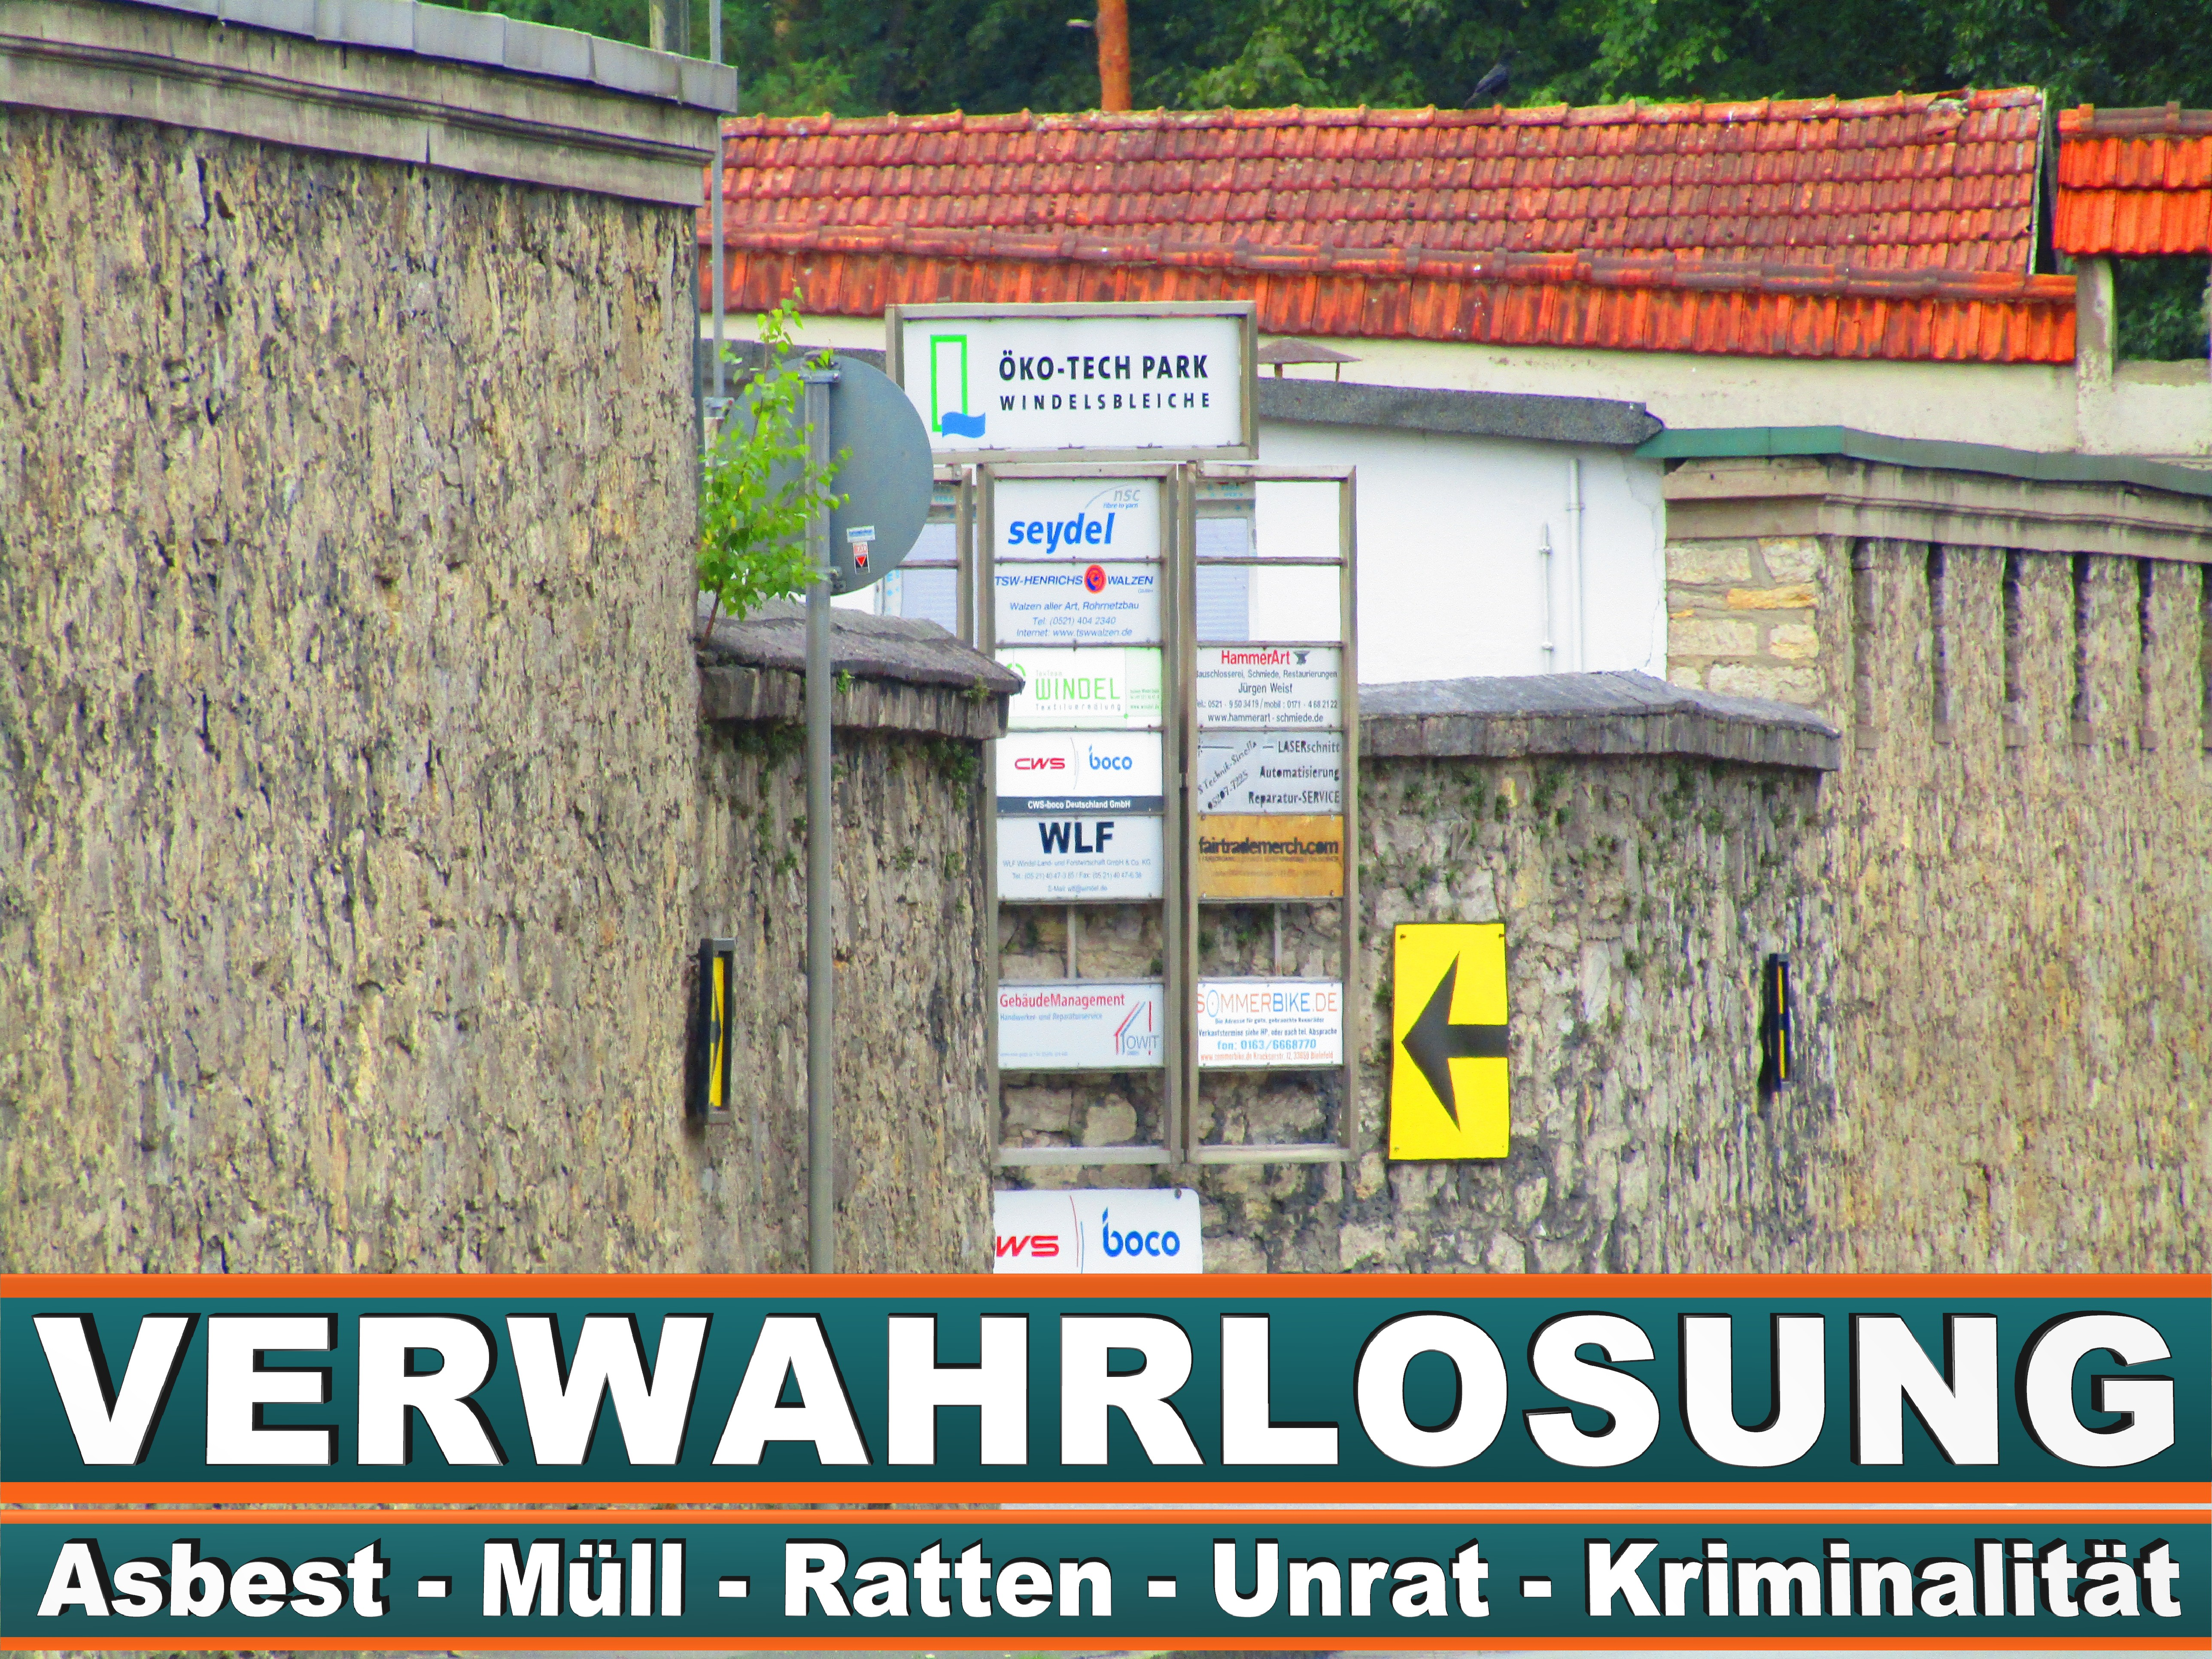 DÜSTERHÖFT MARIO THASSILO DüSTERHöFT WESTRING 44 32051 HERFORD